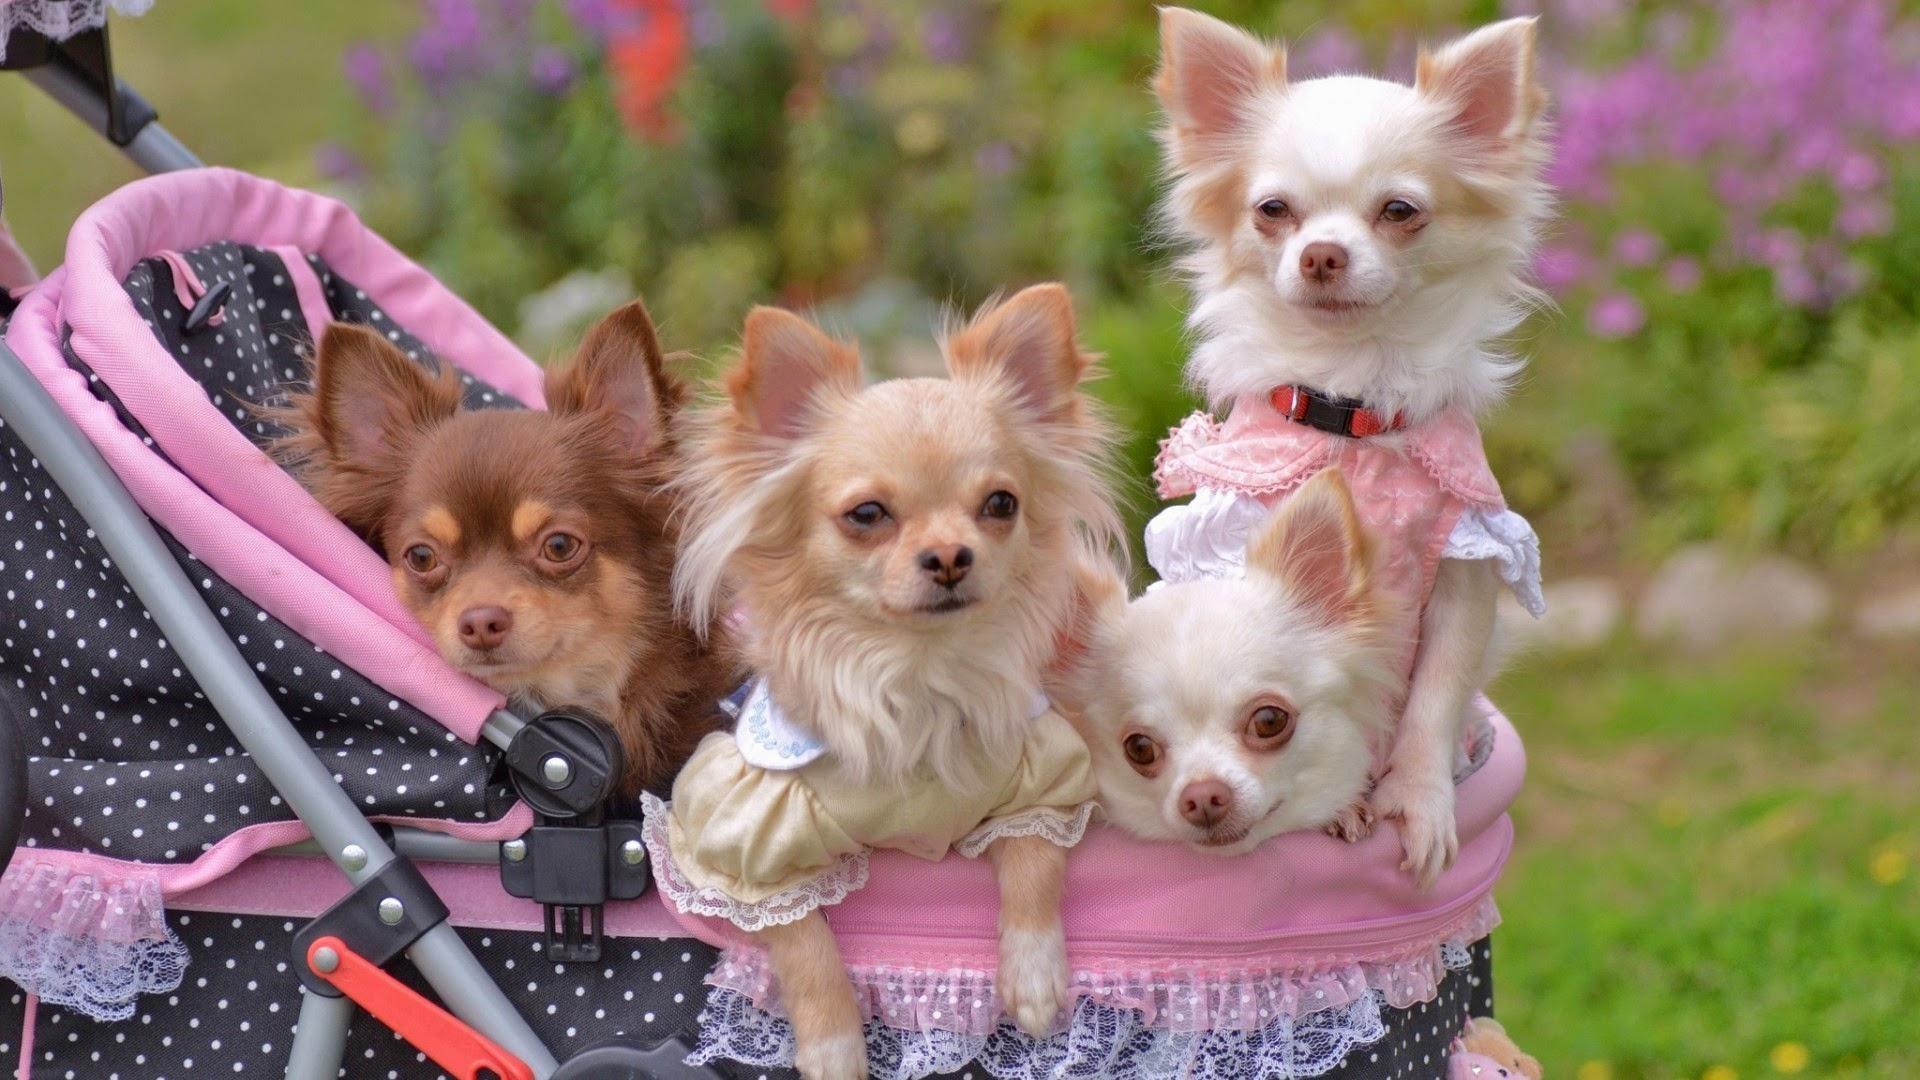 Hermosos-perros-chihuahua-1920×1080-1920%C3%971080-wallpaper-